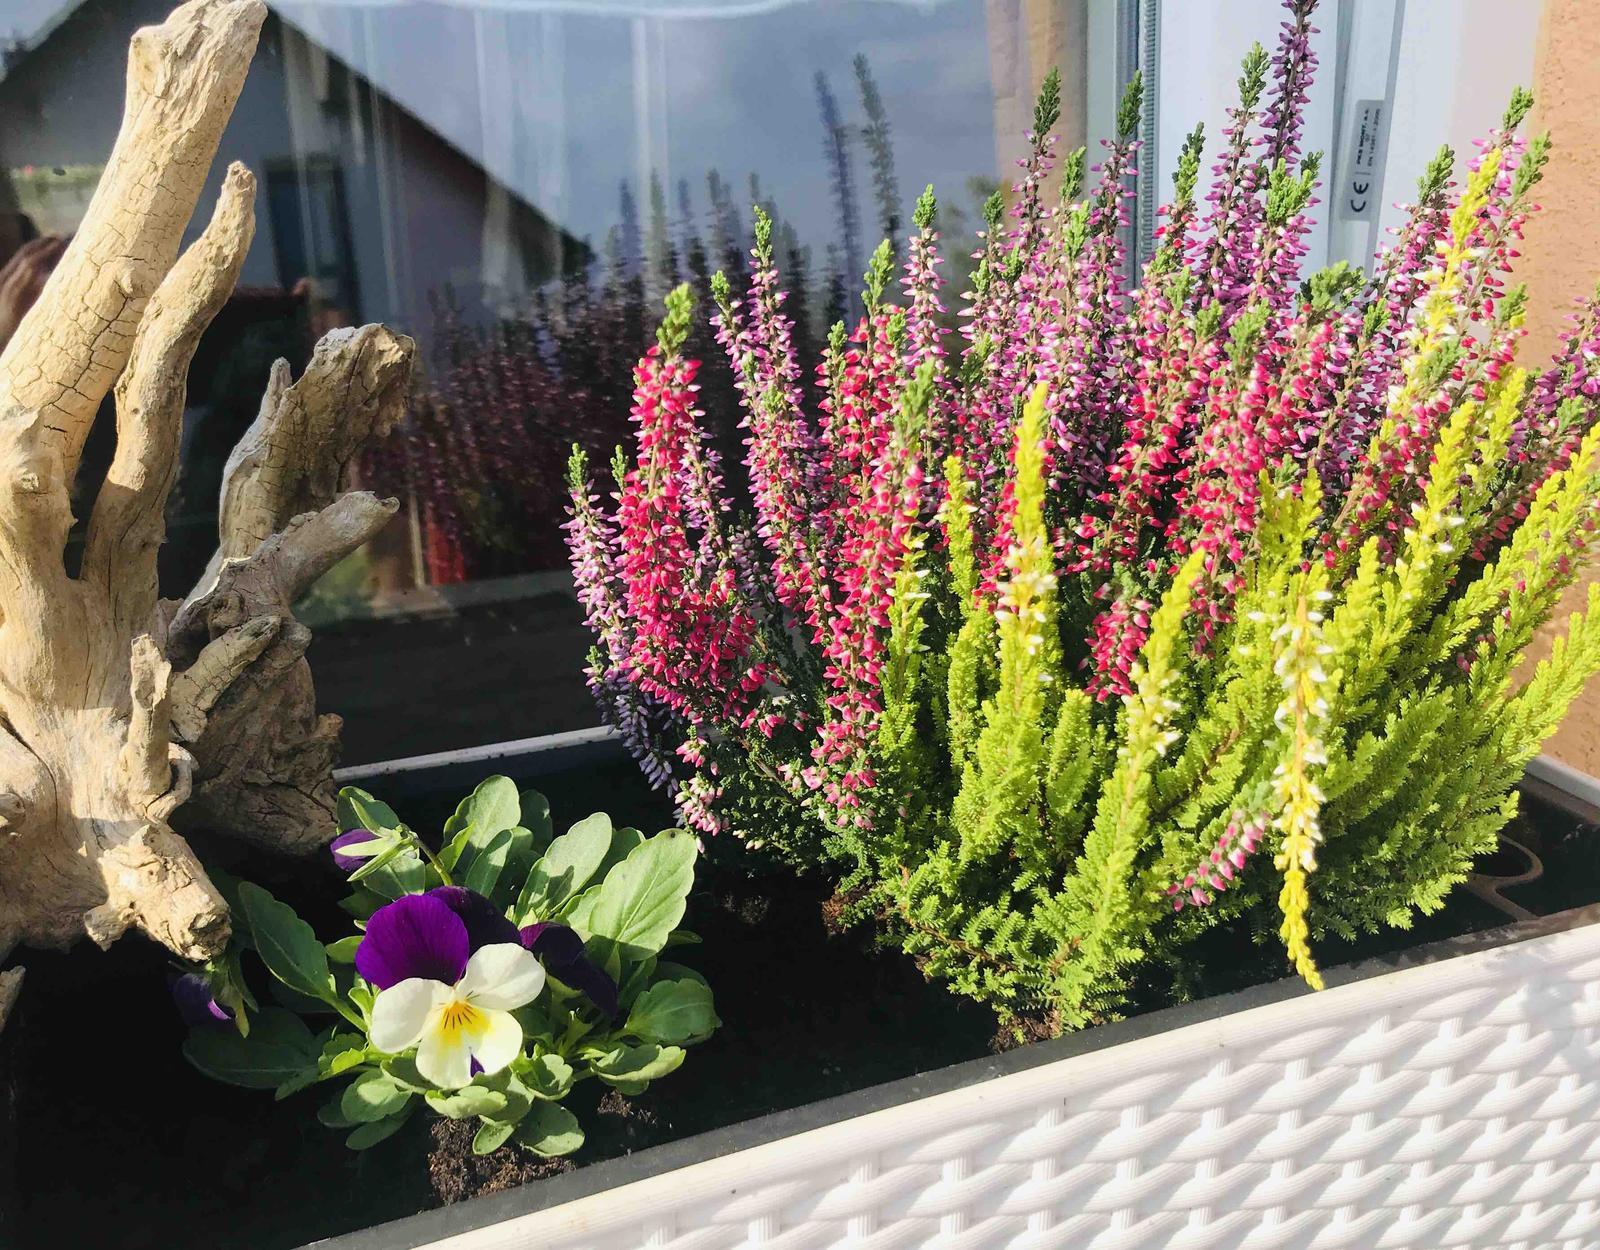 Naše barevná zahrada 🌸 - Obrázek č. 84